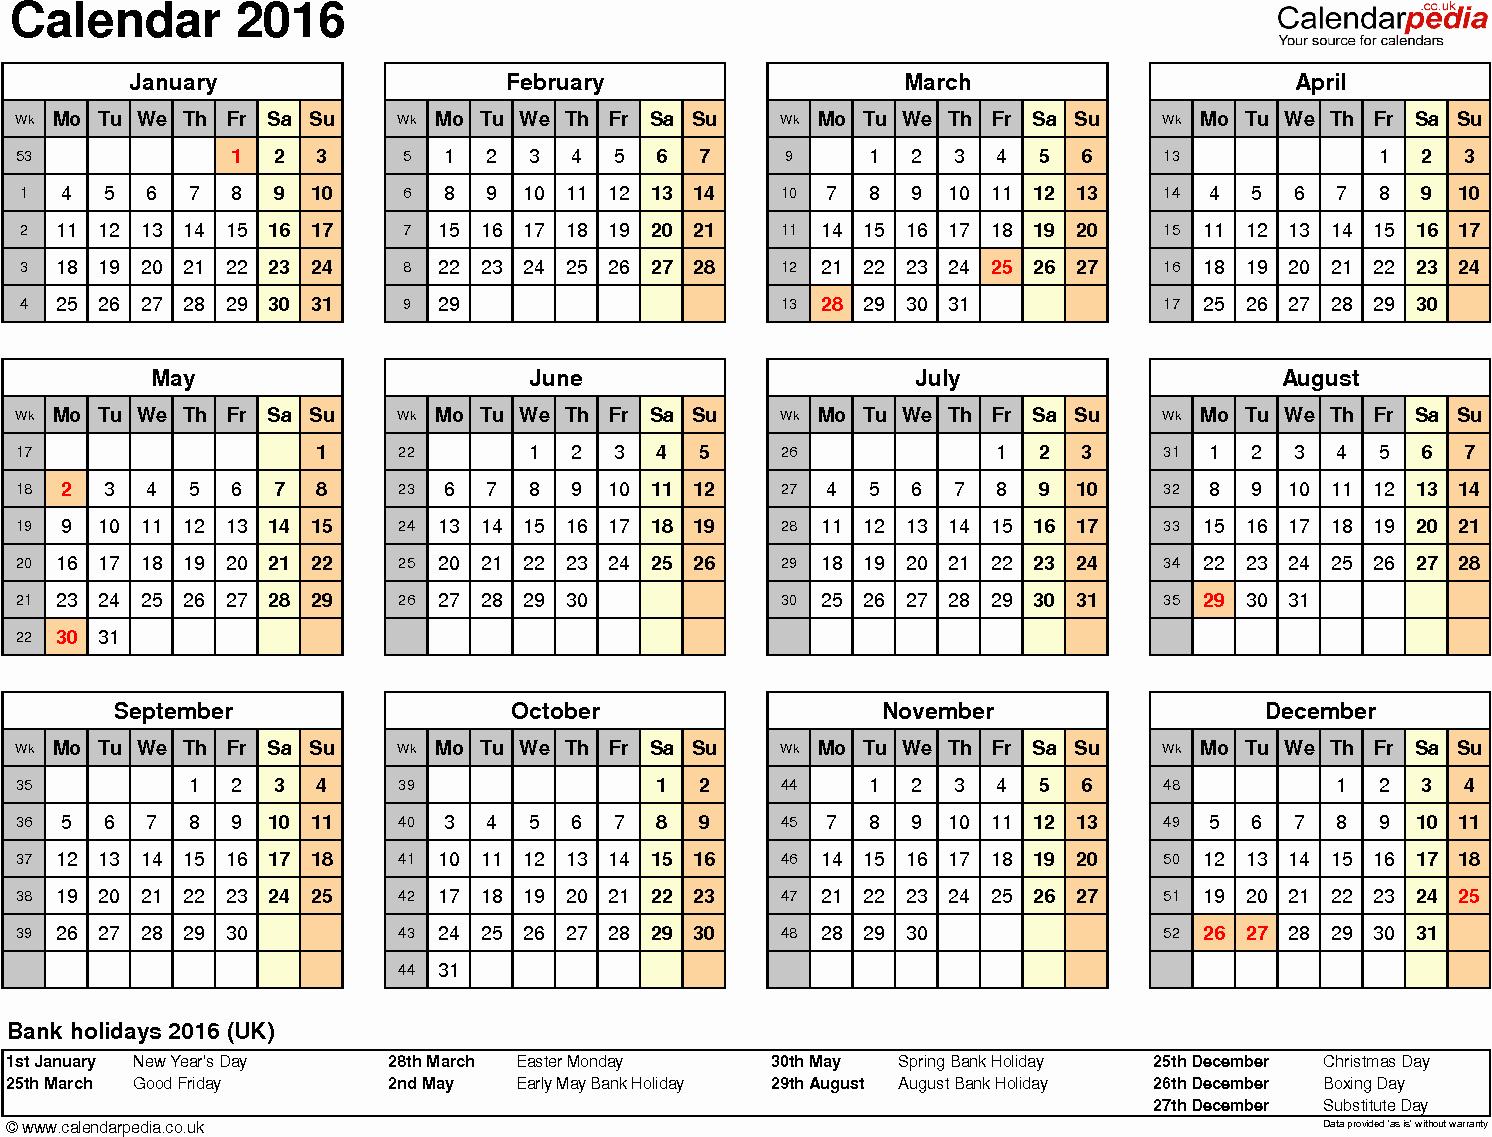 Free Printable Calendars 2016 Templates Fresh Calendar 2016 Uk 16 Free Printable Word Templates